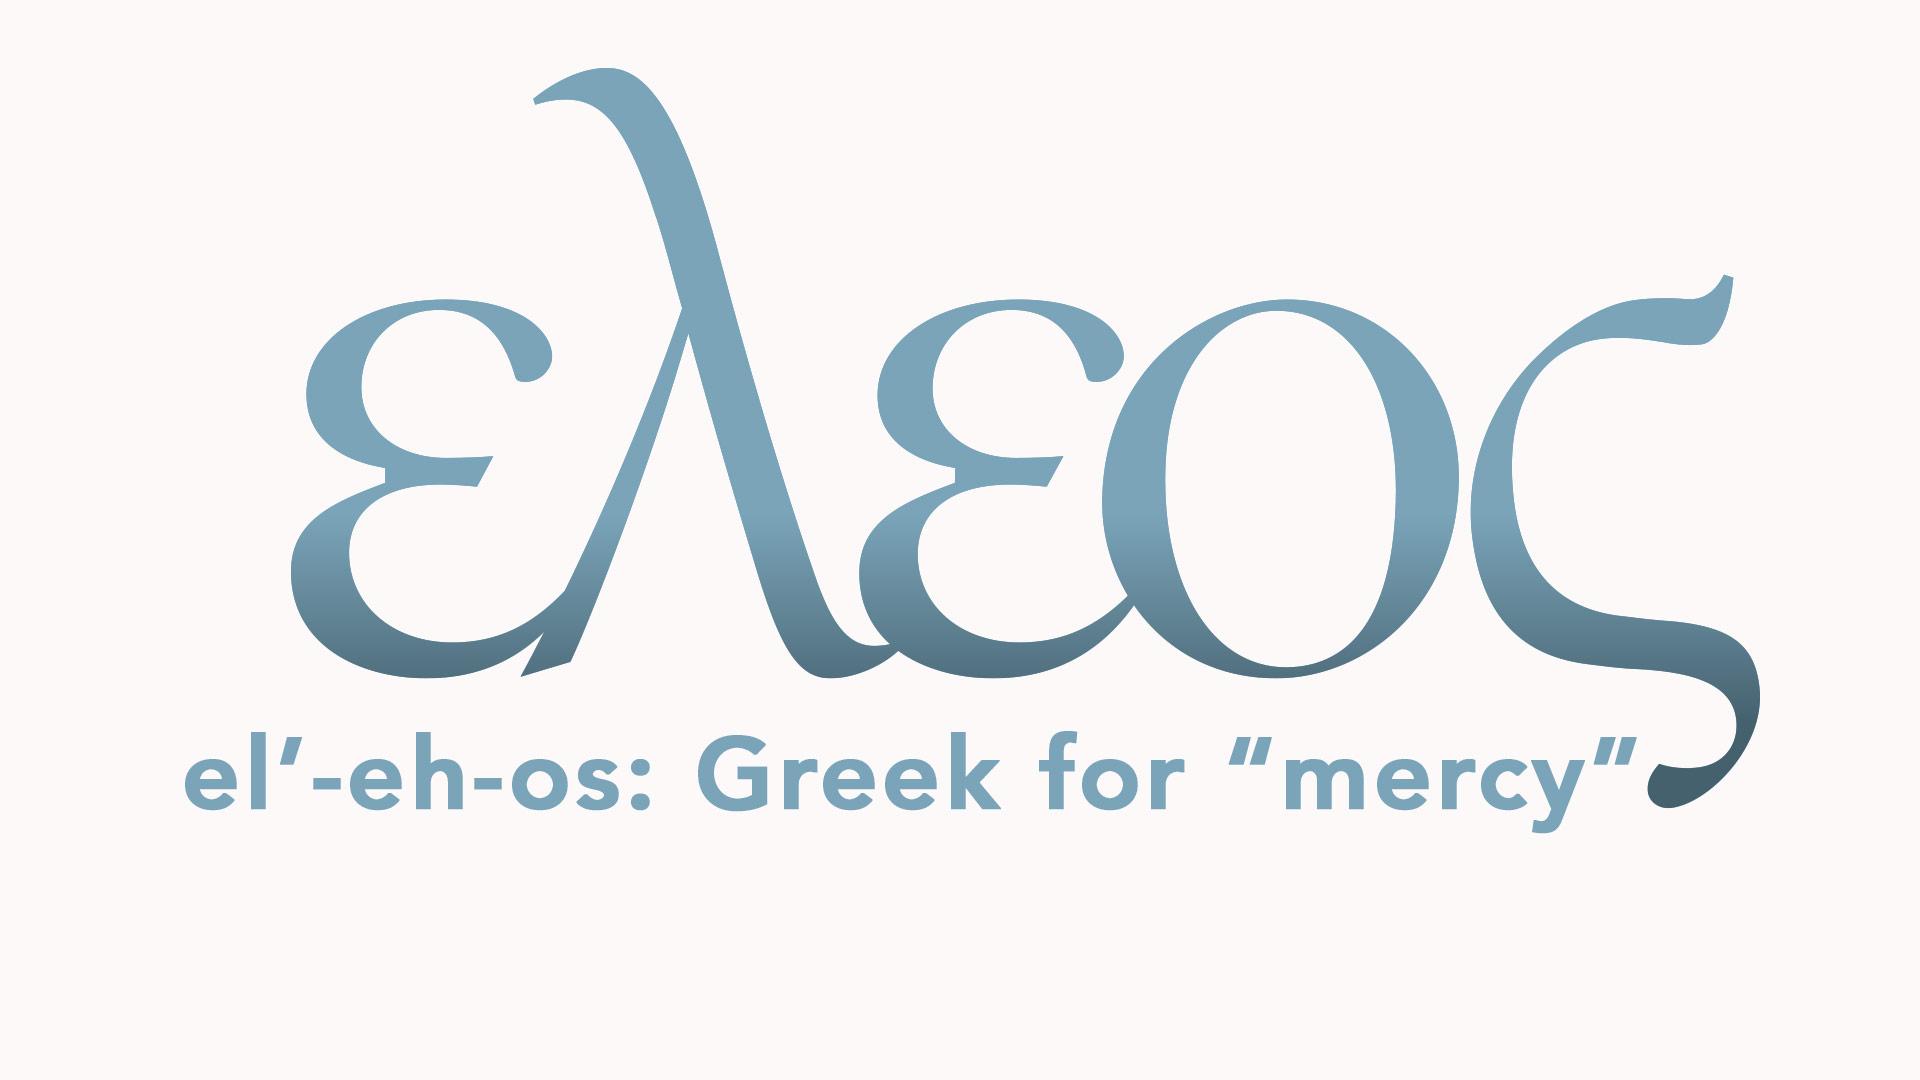 Eleos-generic_logo_Mercy.jpg